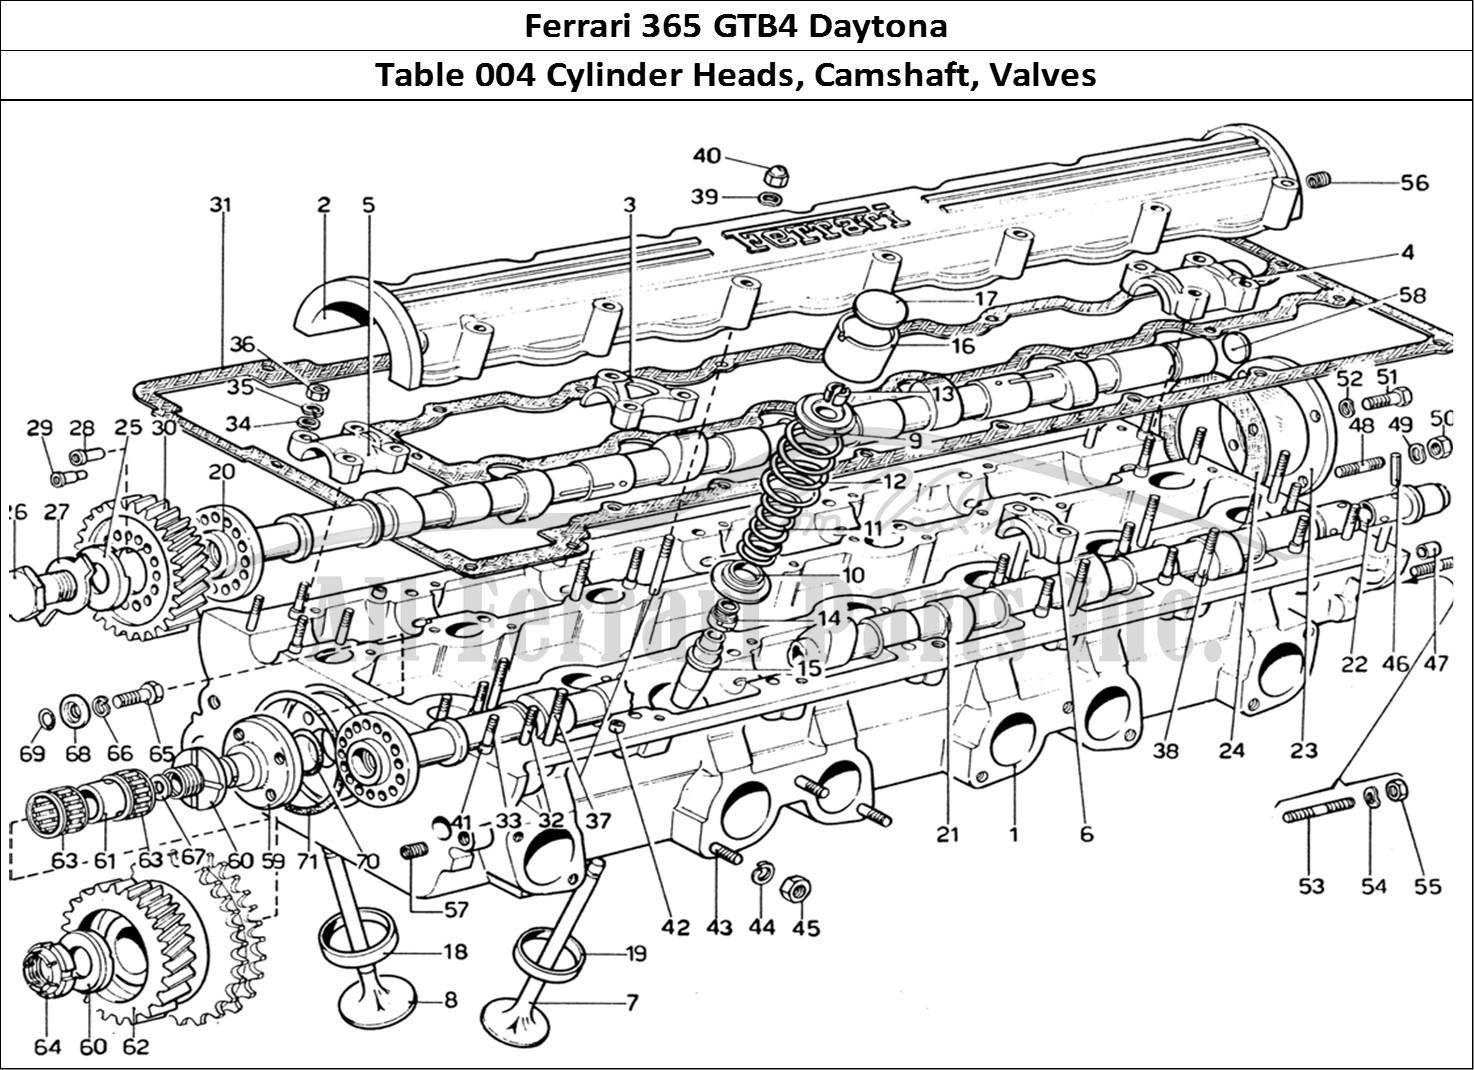 hight resolution of engine heads diagram wiring diagram databasebuy original ferrari 365 gtb4 daytona 004 cylinder heads camshaft